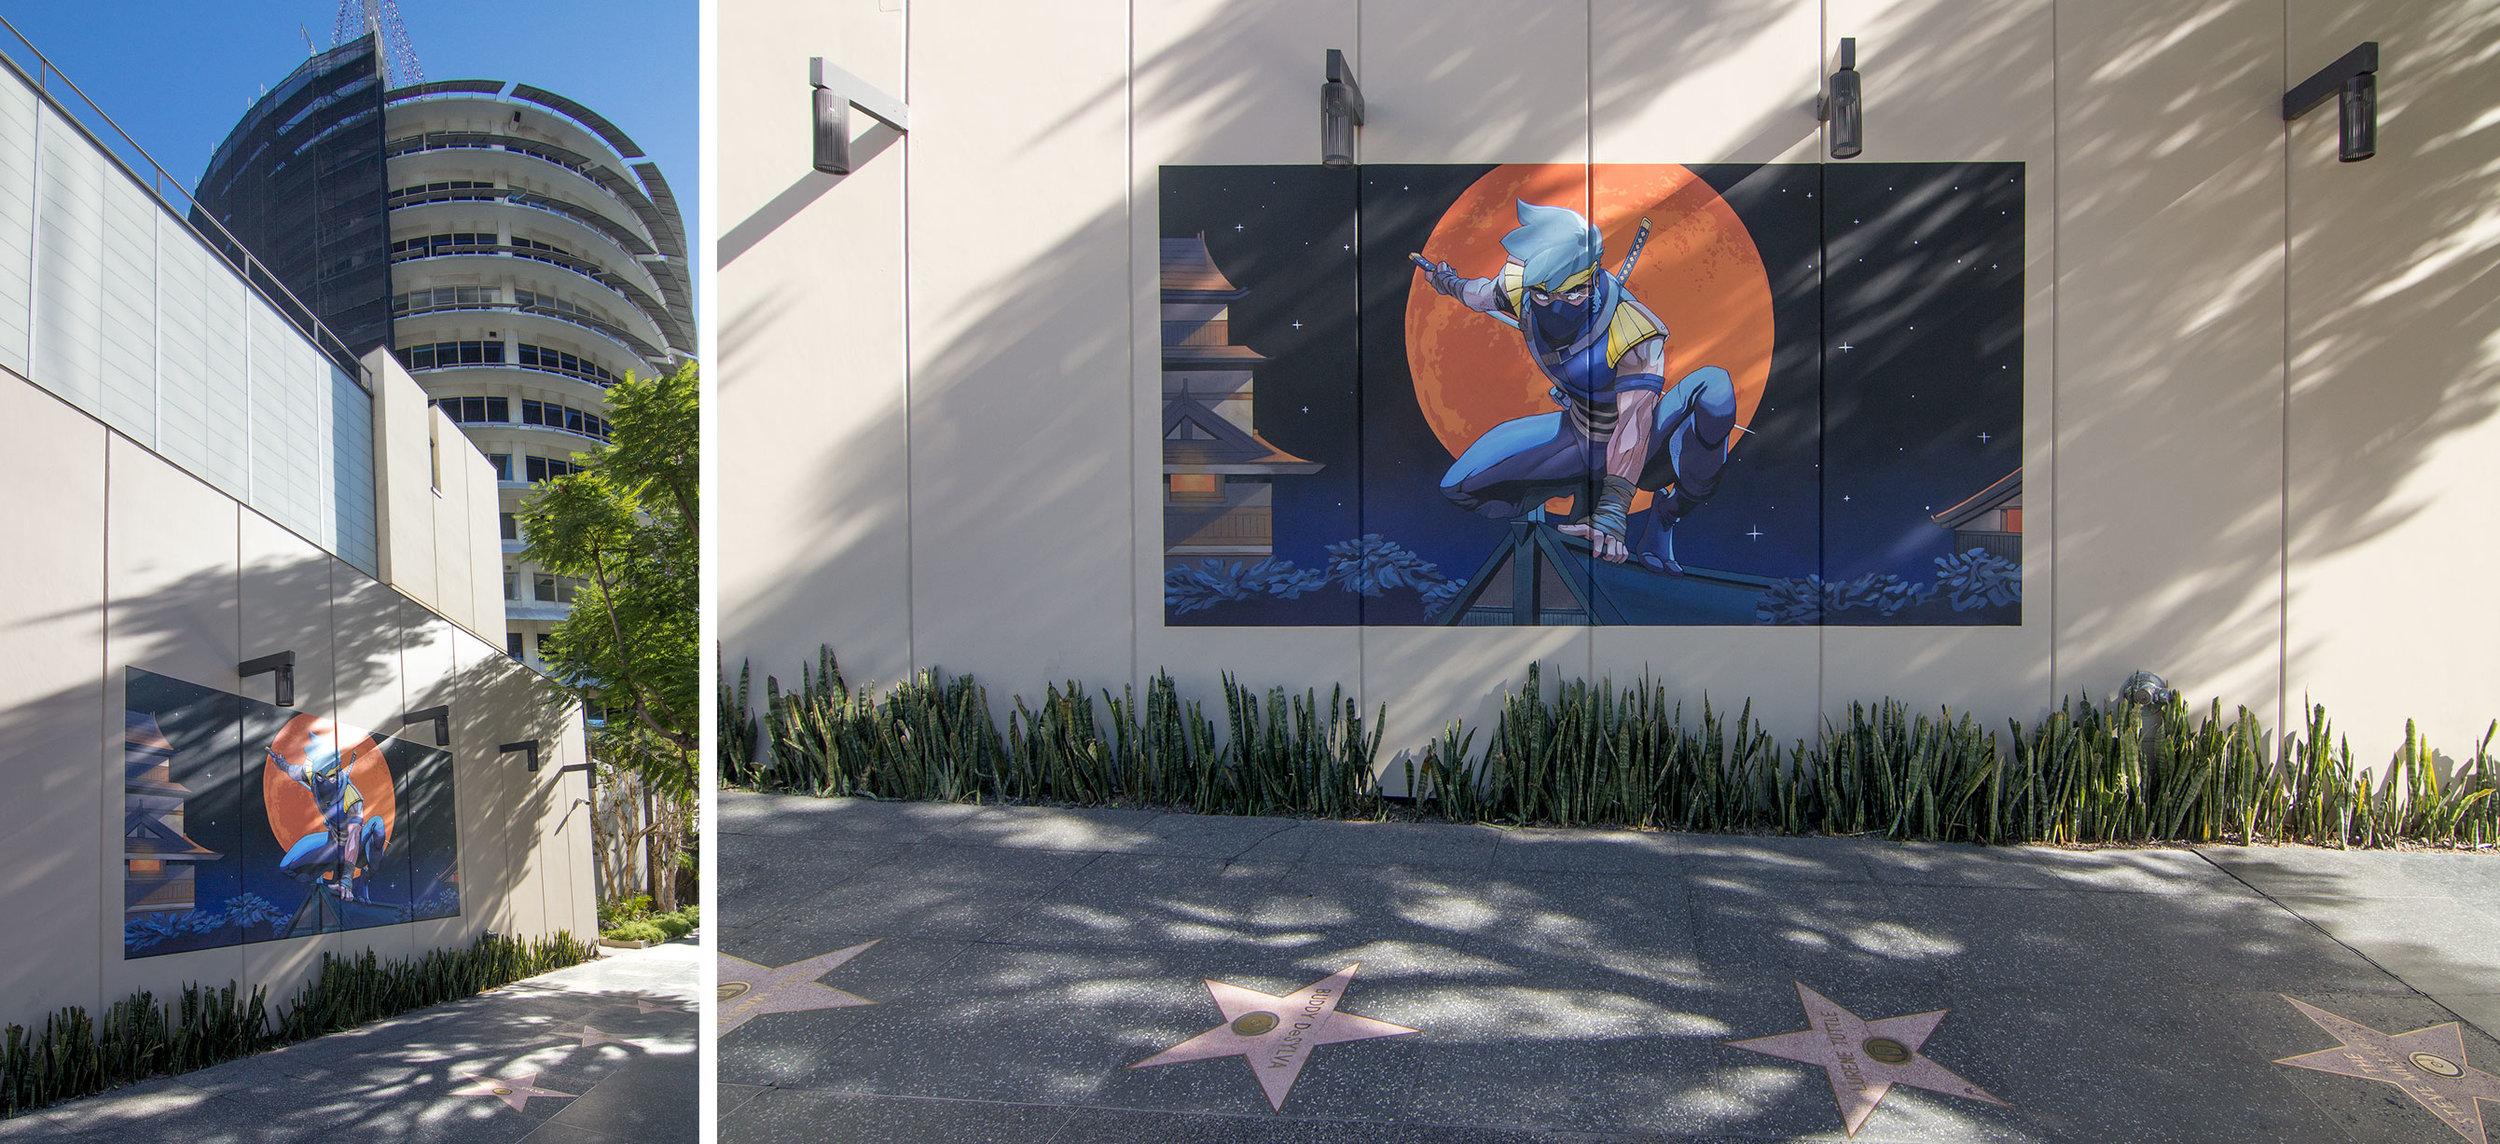 Ninjawerks Album Release | Astralwerks | Capital Records, Hollywood, CA